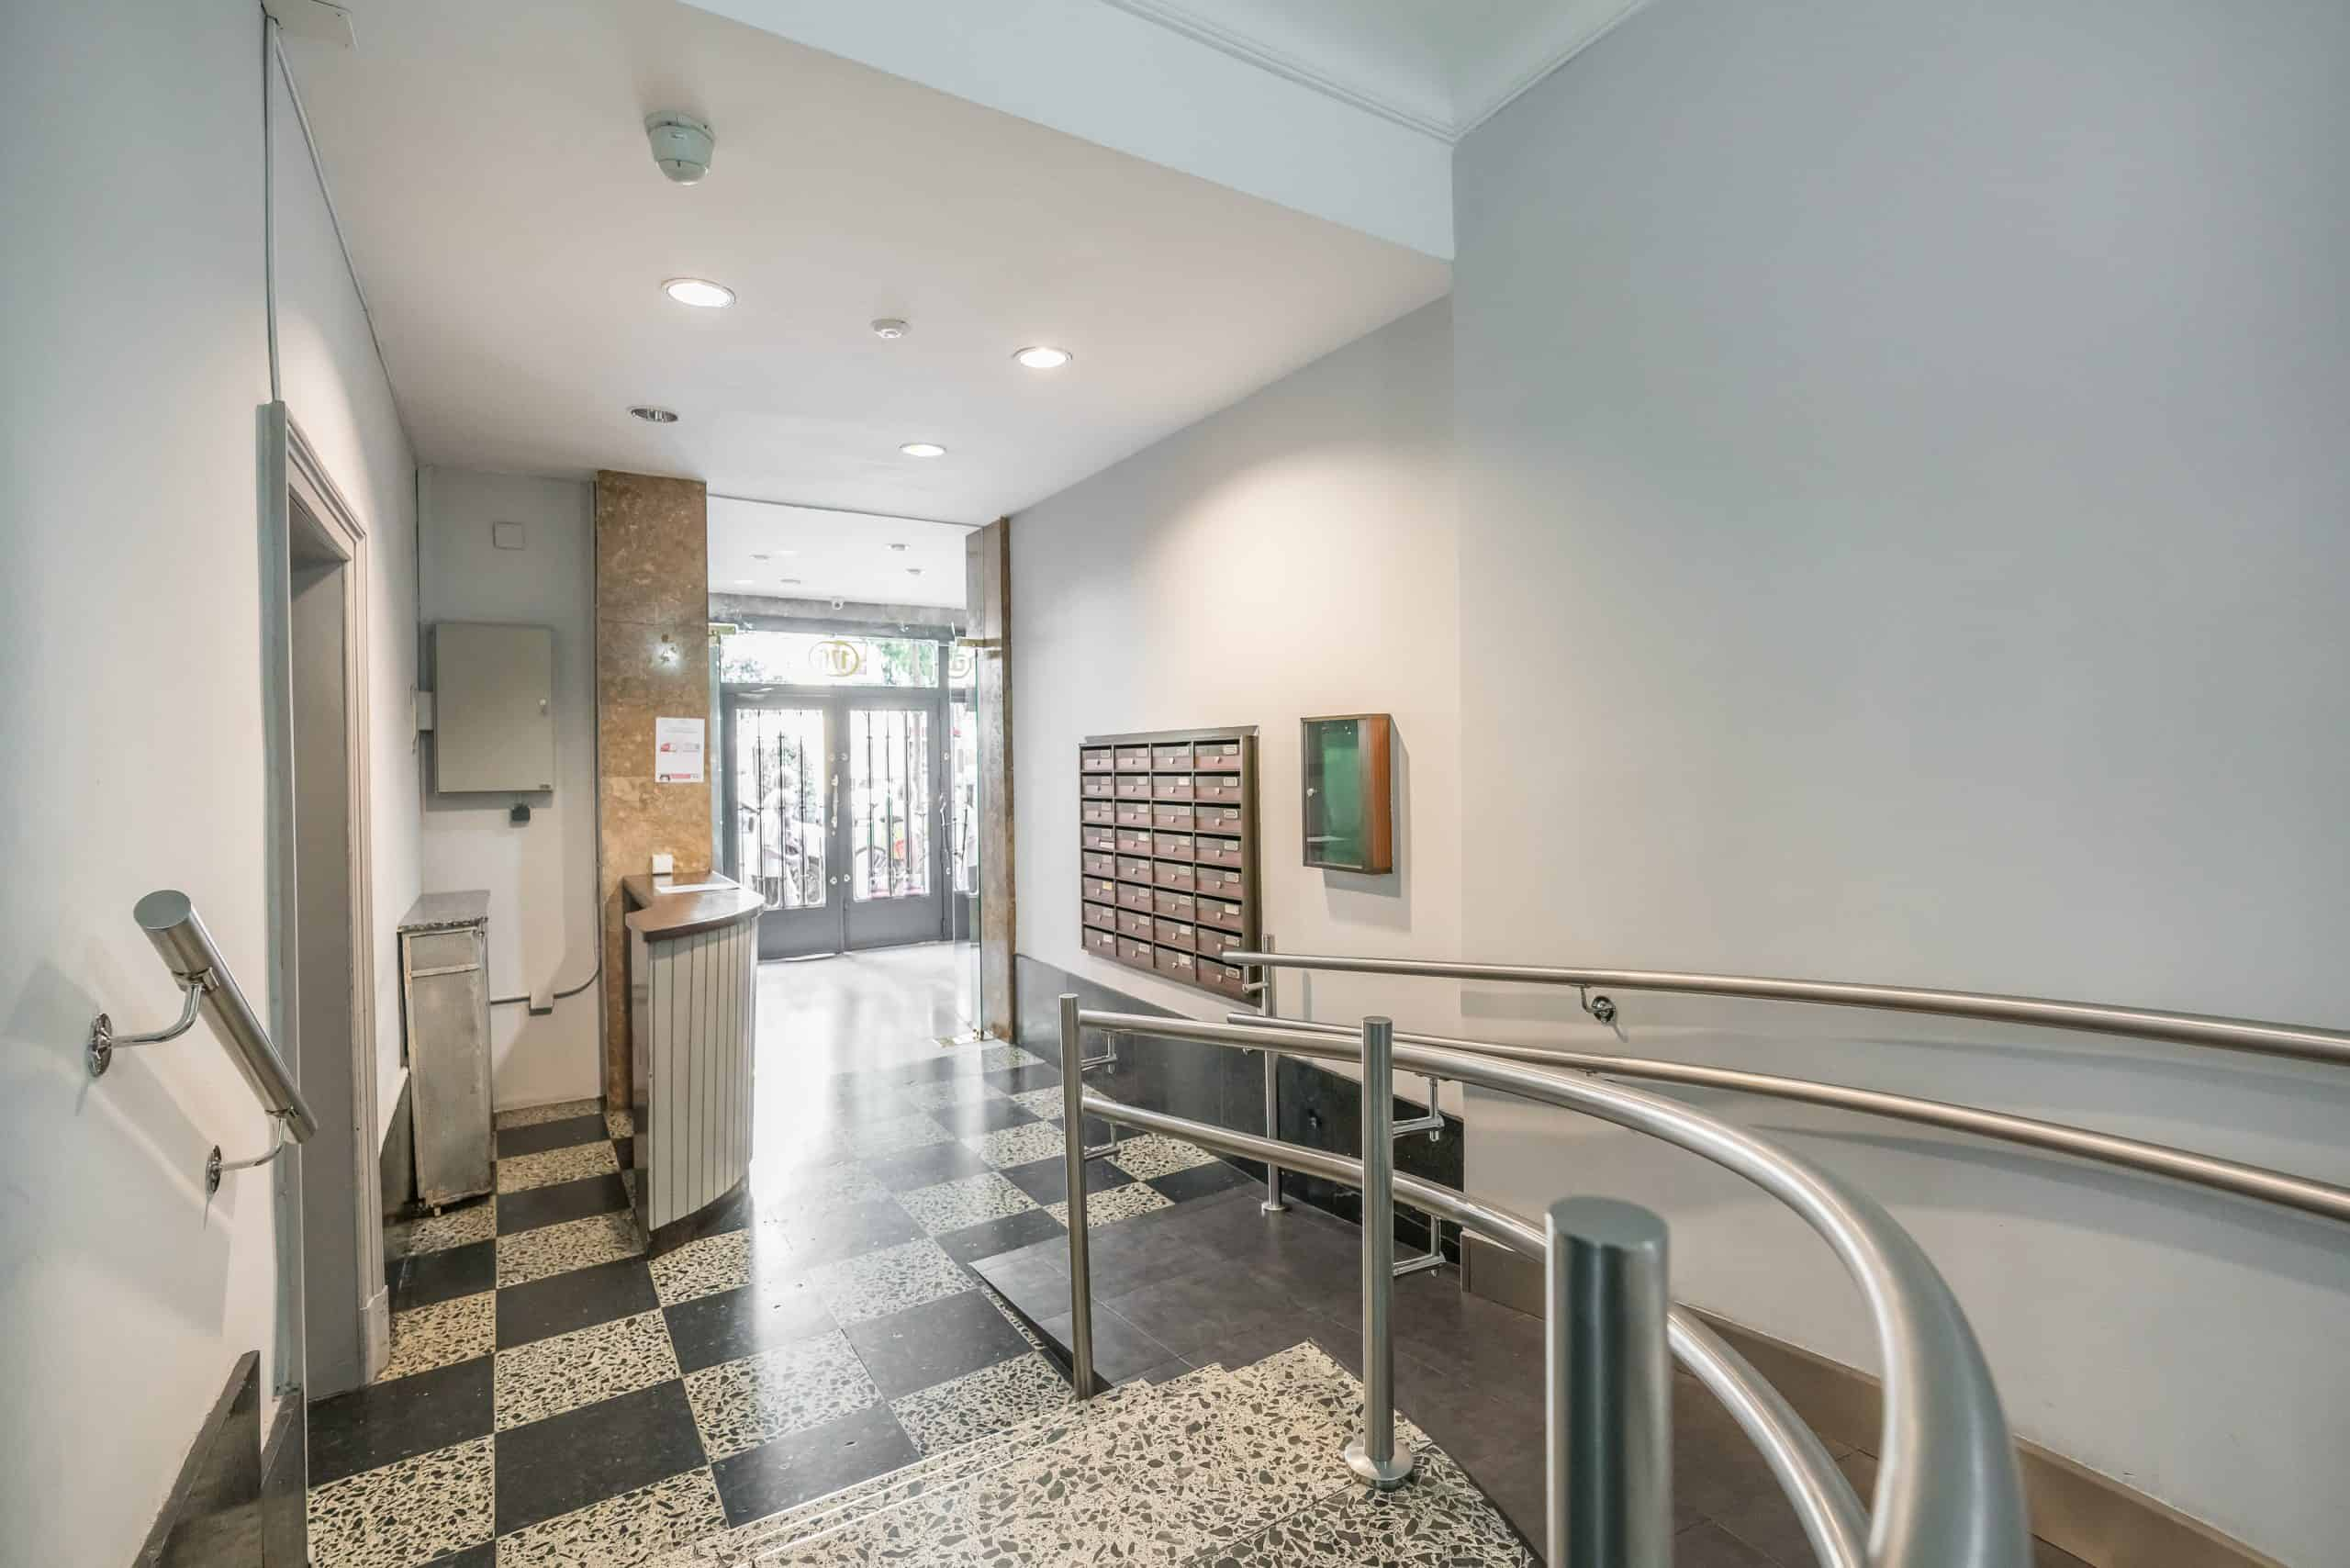 Agencia Inmobiliaria de Madrid-FUTUROCASA-calle Embajadores-Chopera-Arganzuela8 ZONAS COMUNES (2)